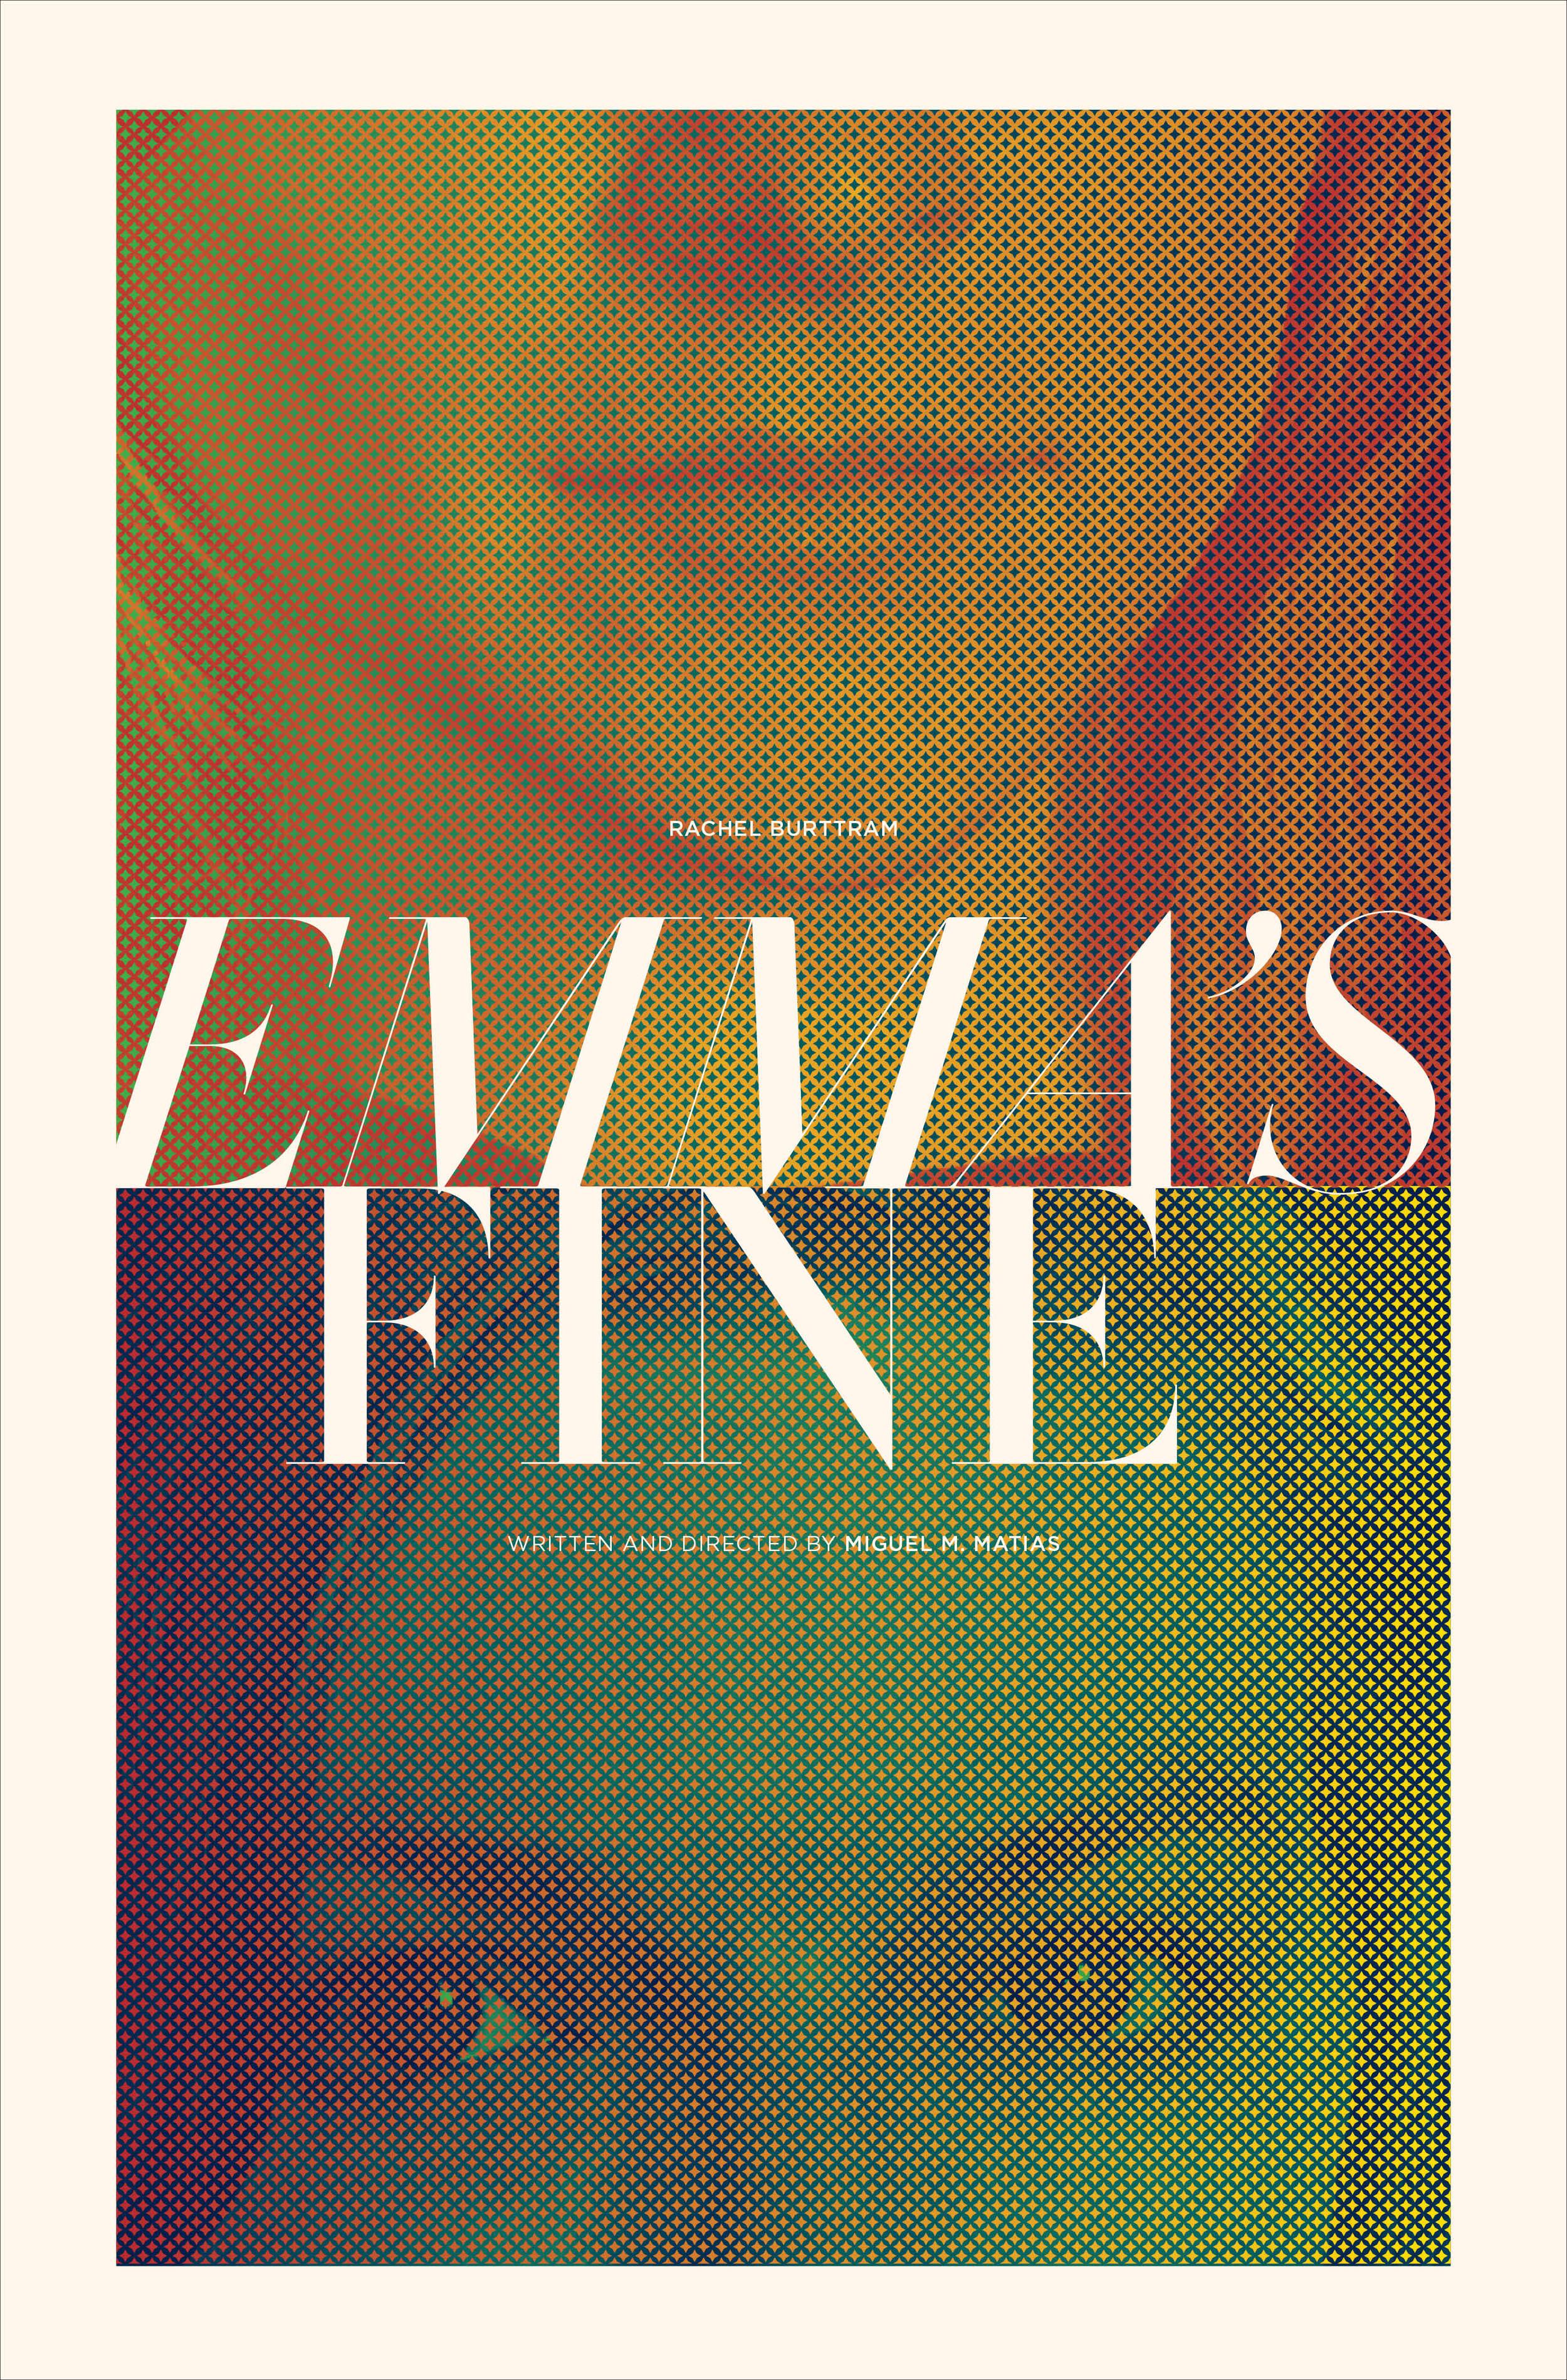 Poster-EmmasFine-27x41-A.jpg